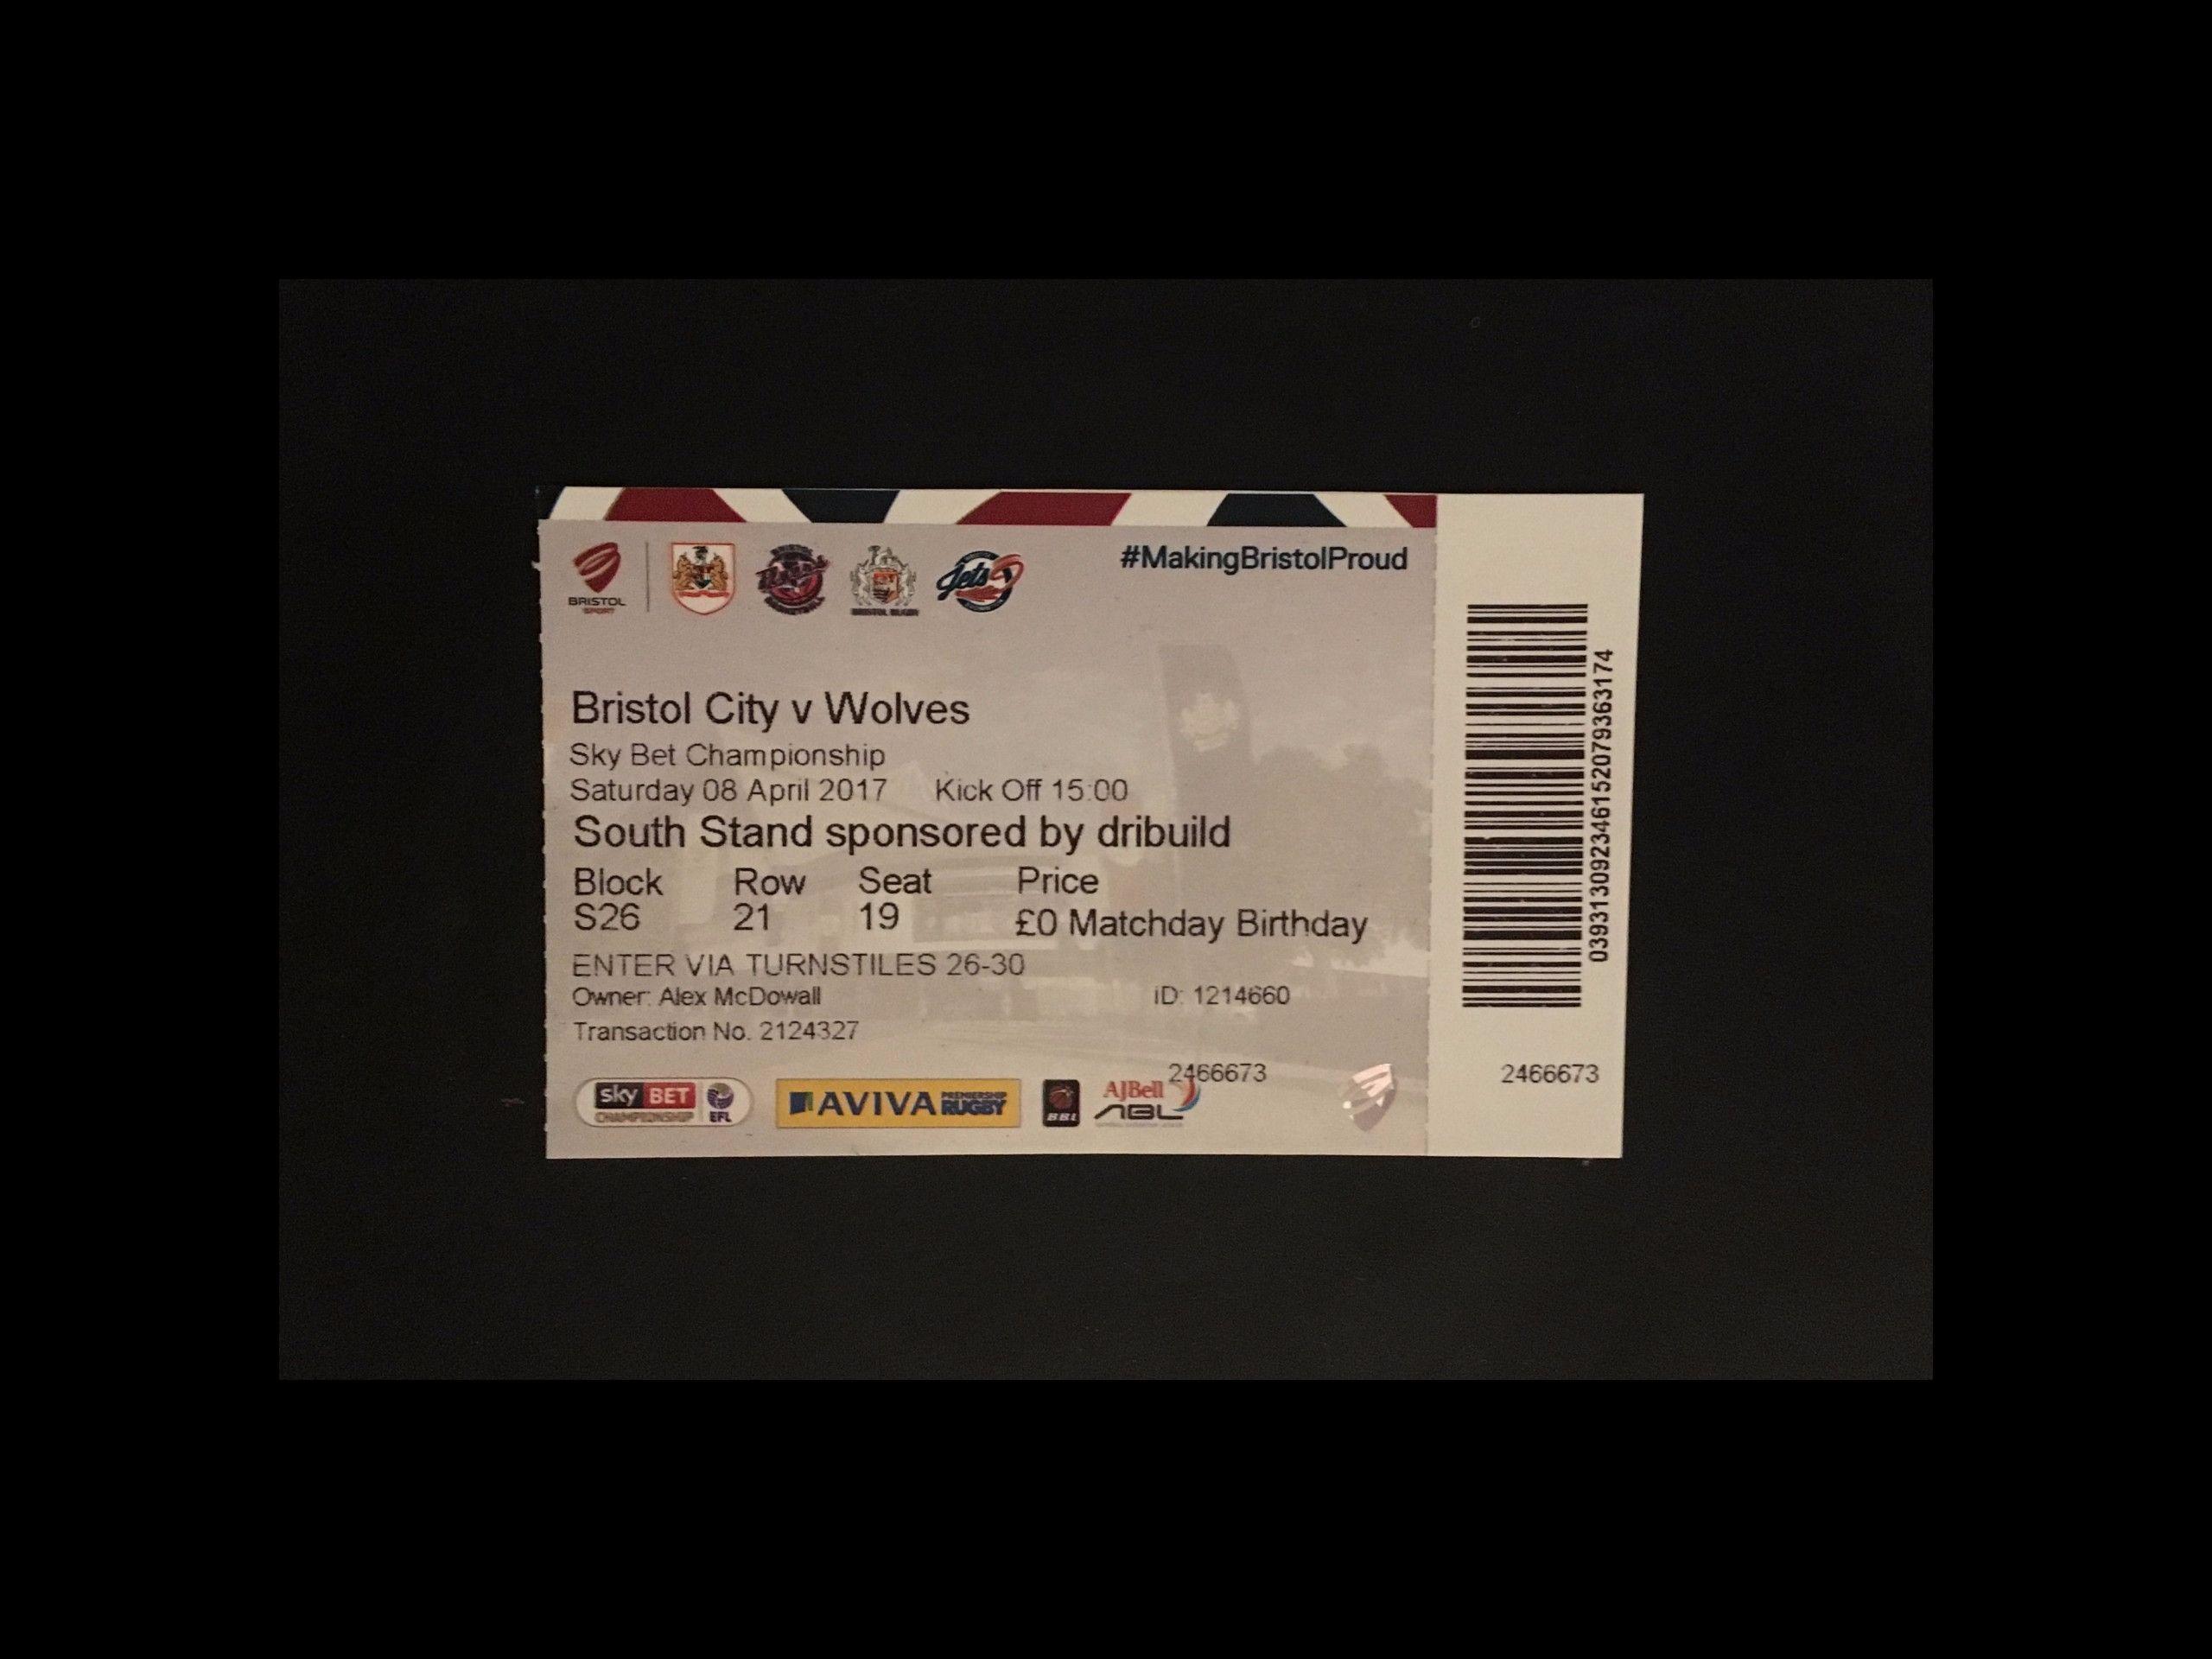 Bristol City v Wolves 08-04-2017